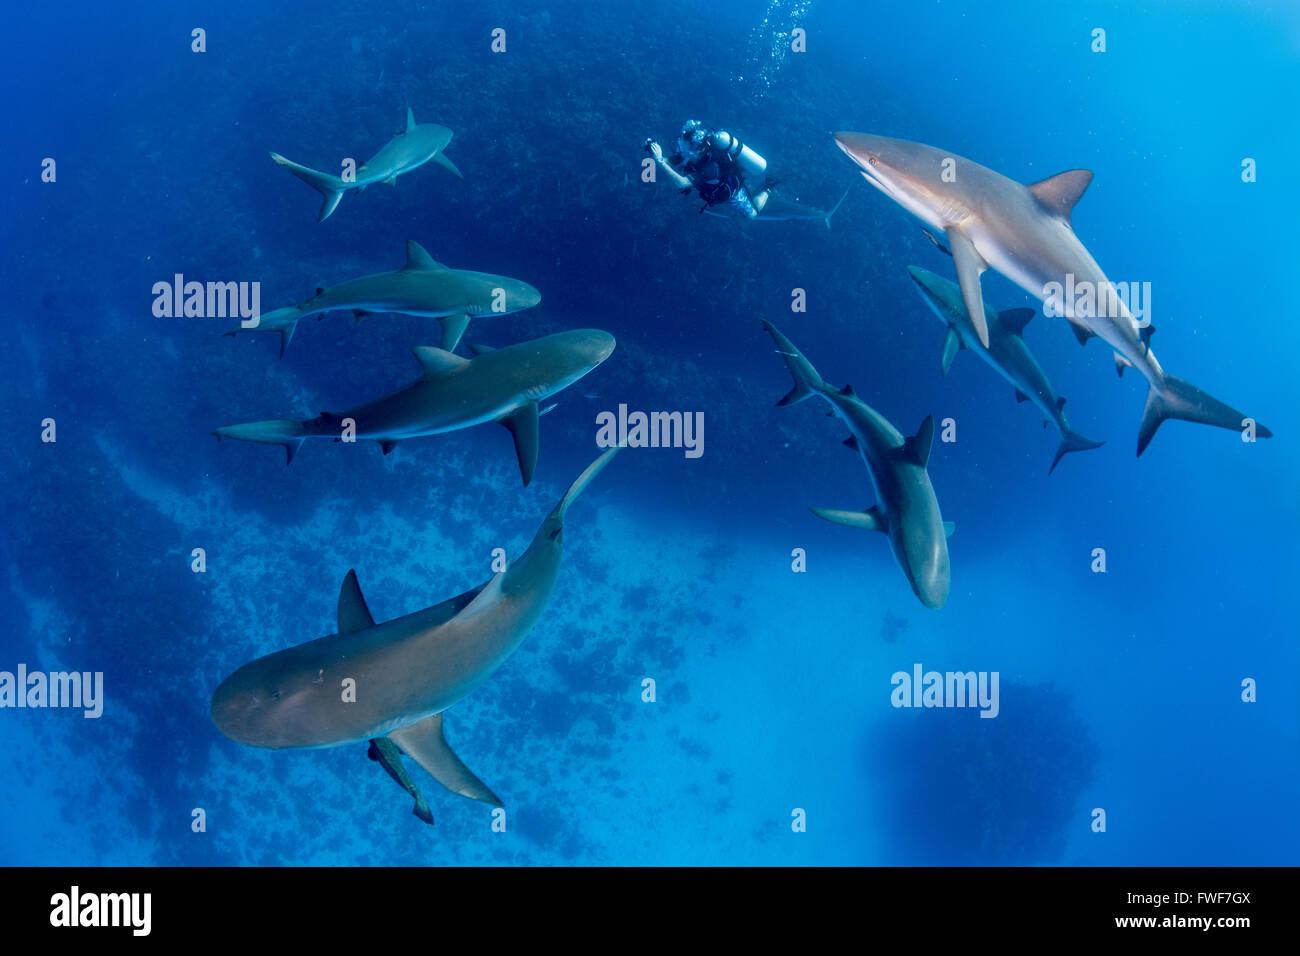 Caribbean reef sharks, Carcharhinus perezi, Jardines de la Reina, Cuba, Caribbean Sea Stock Photo